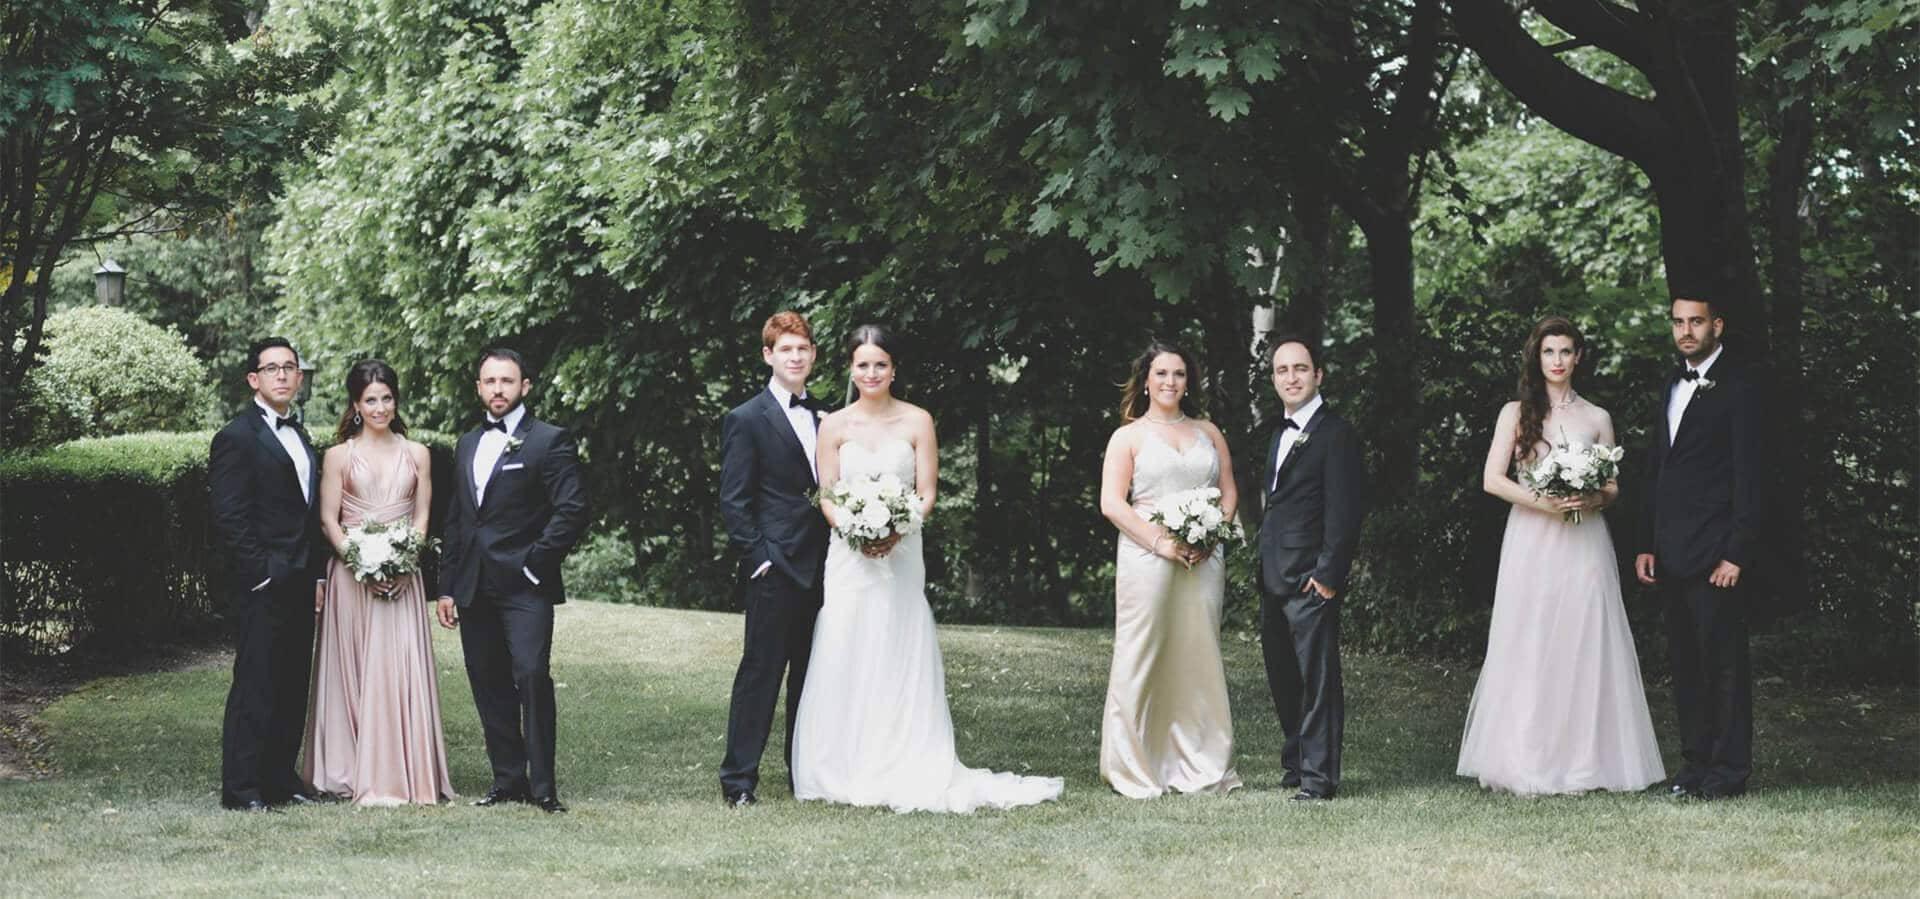 Hero image for Haley and Elliot's Classically Elegant Wedding at The Estates Of Sunnybrook